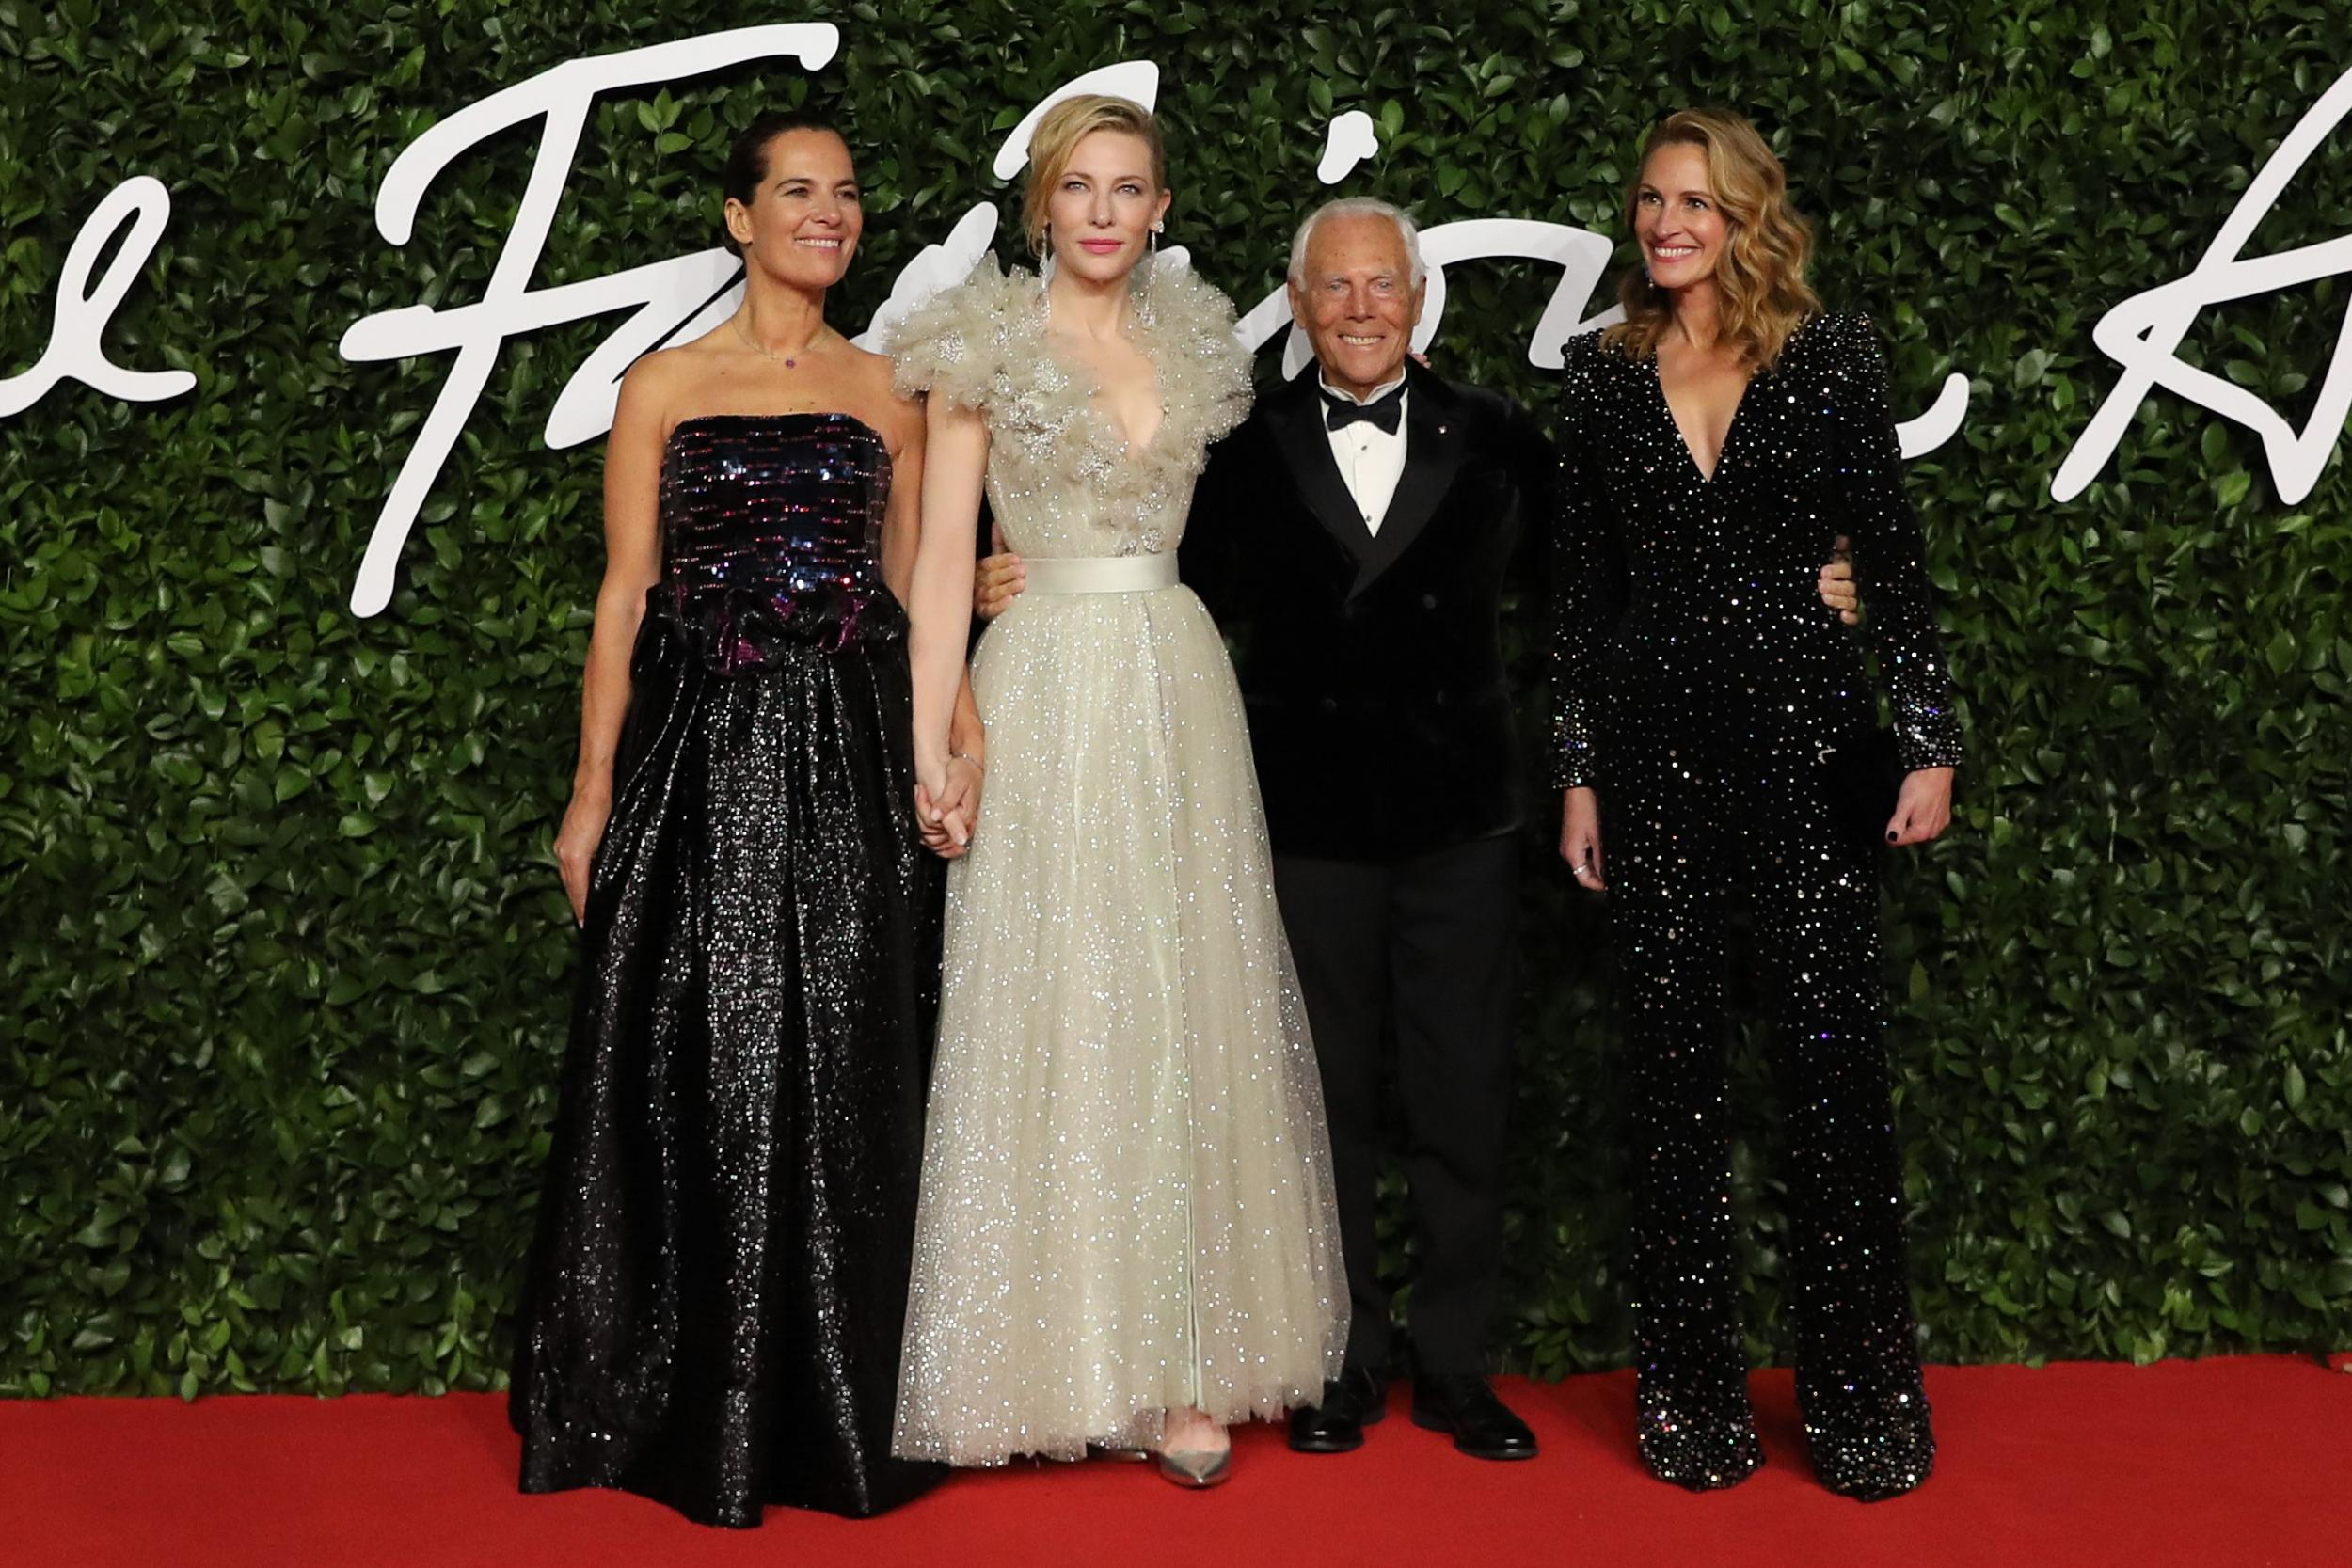 Roberta Armani, Cate Blanchett, Giorgio Armani and Julia Roberts